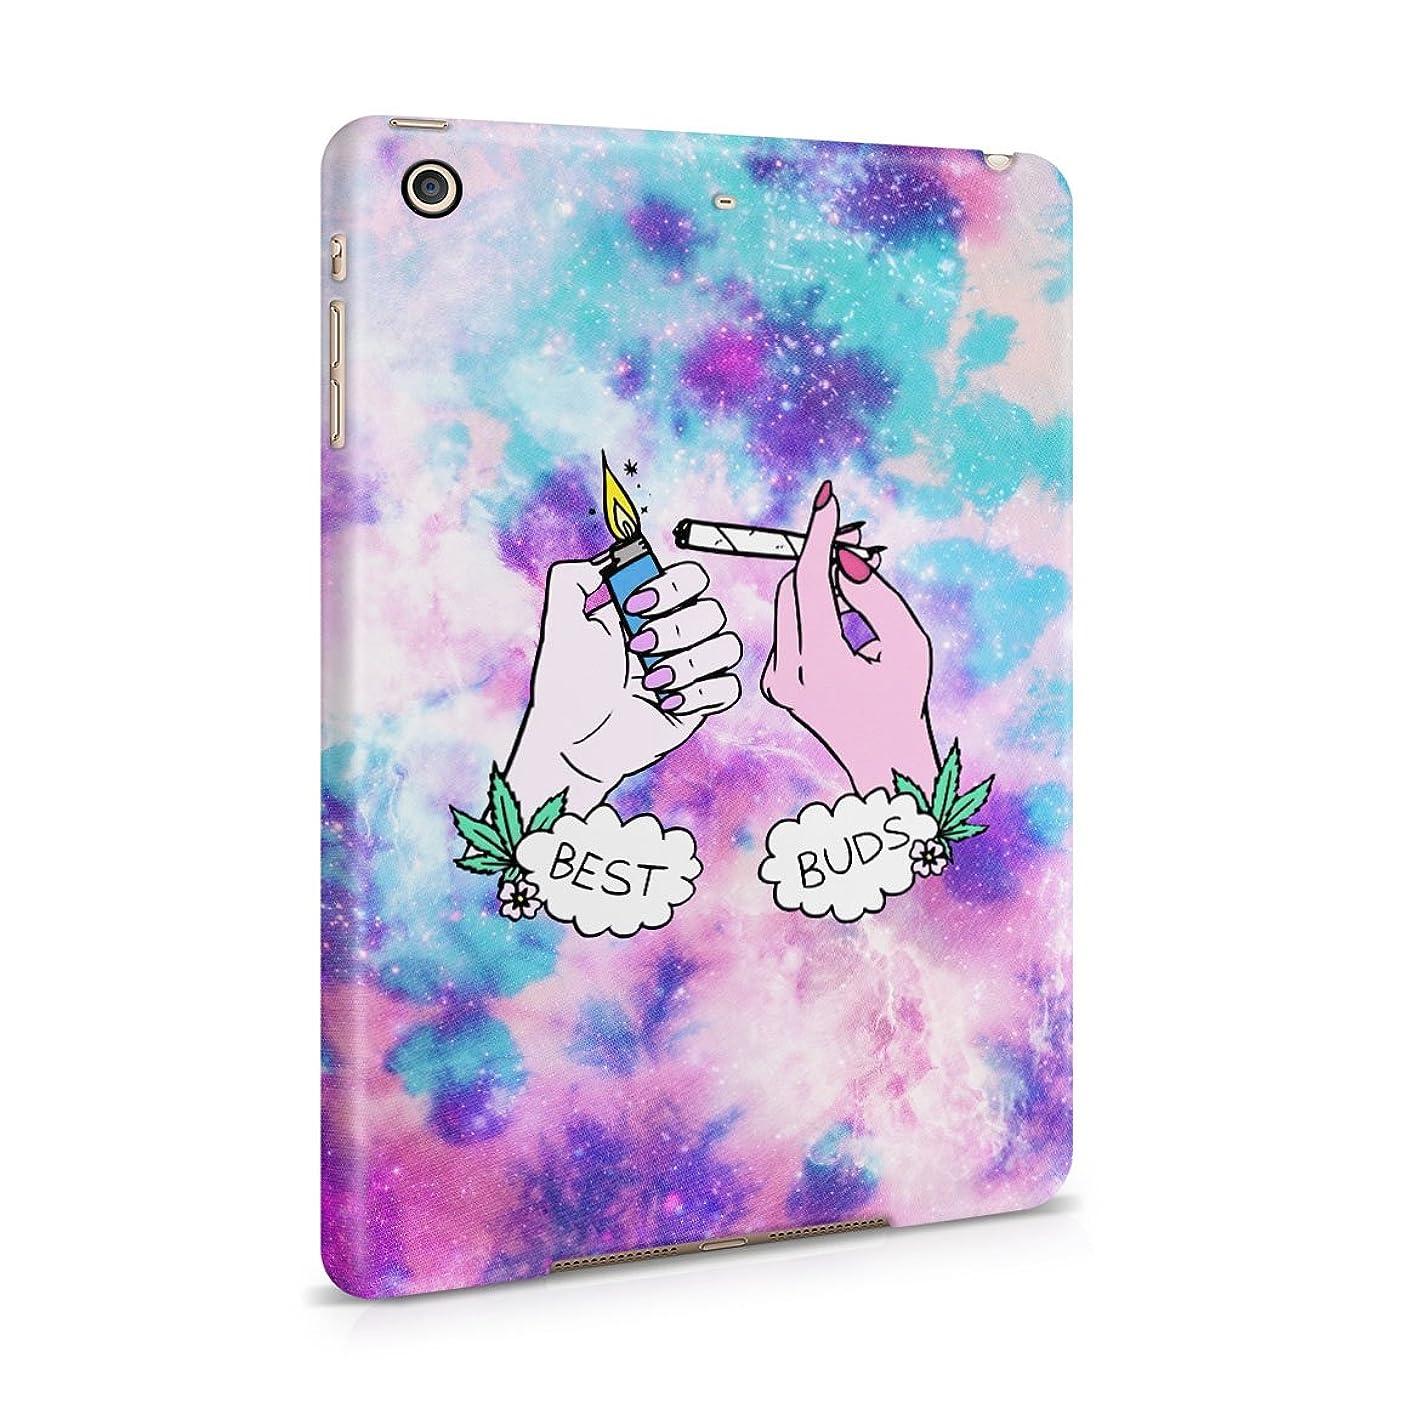 Best Buds Lighting Blunt Trippy Acid Space Hard Plastic Tablet Case For iPad Mini 2 & 3